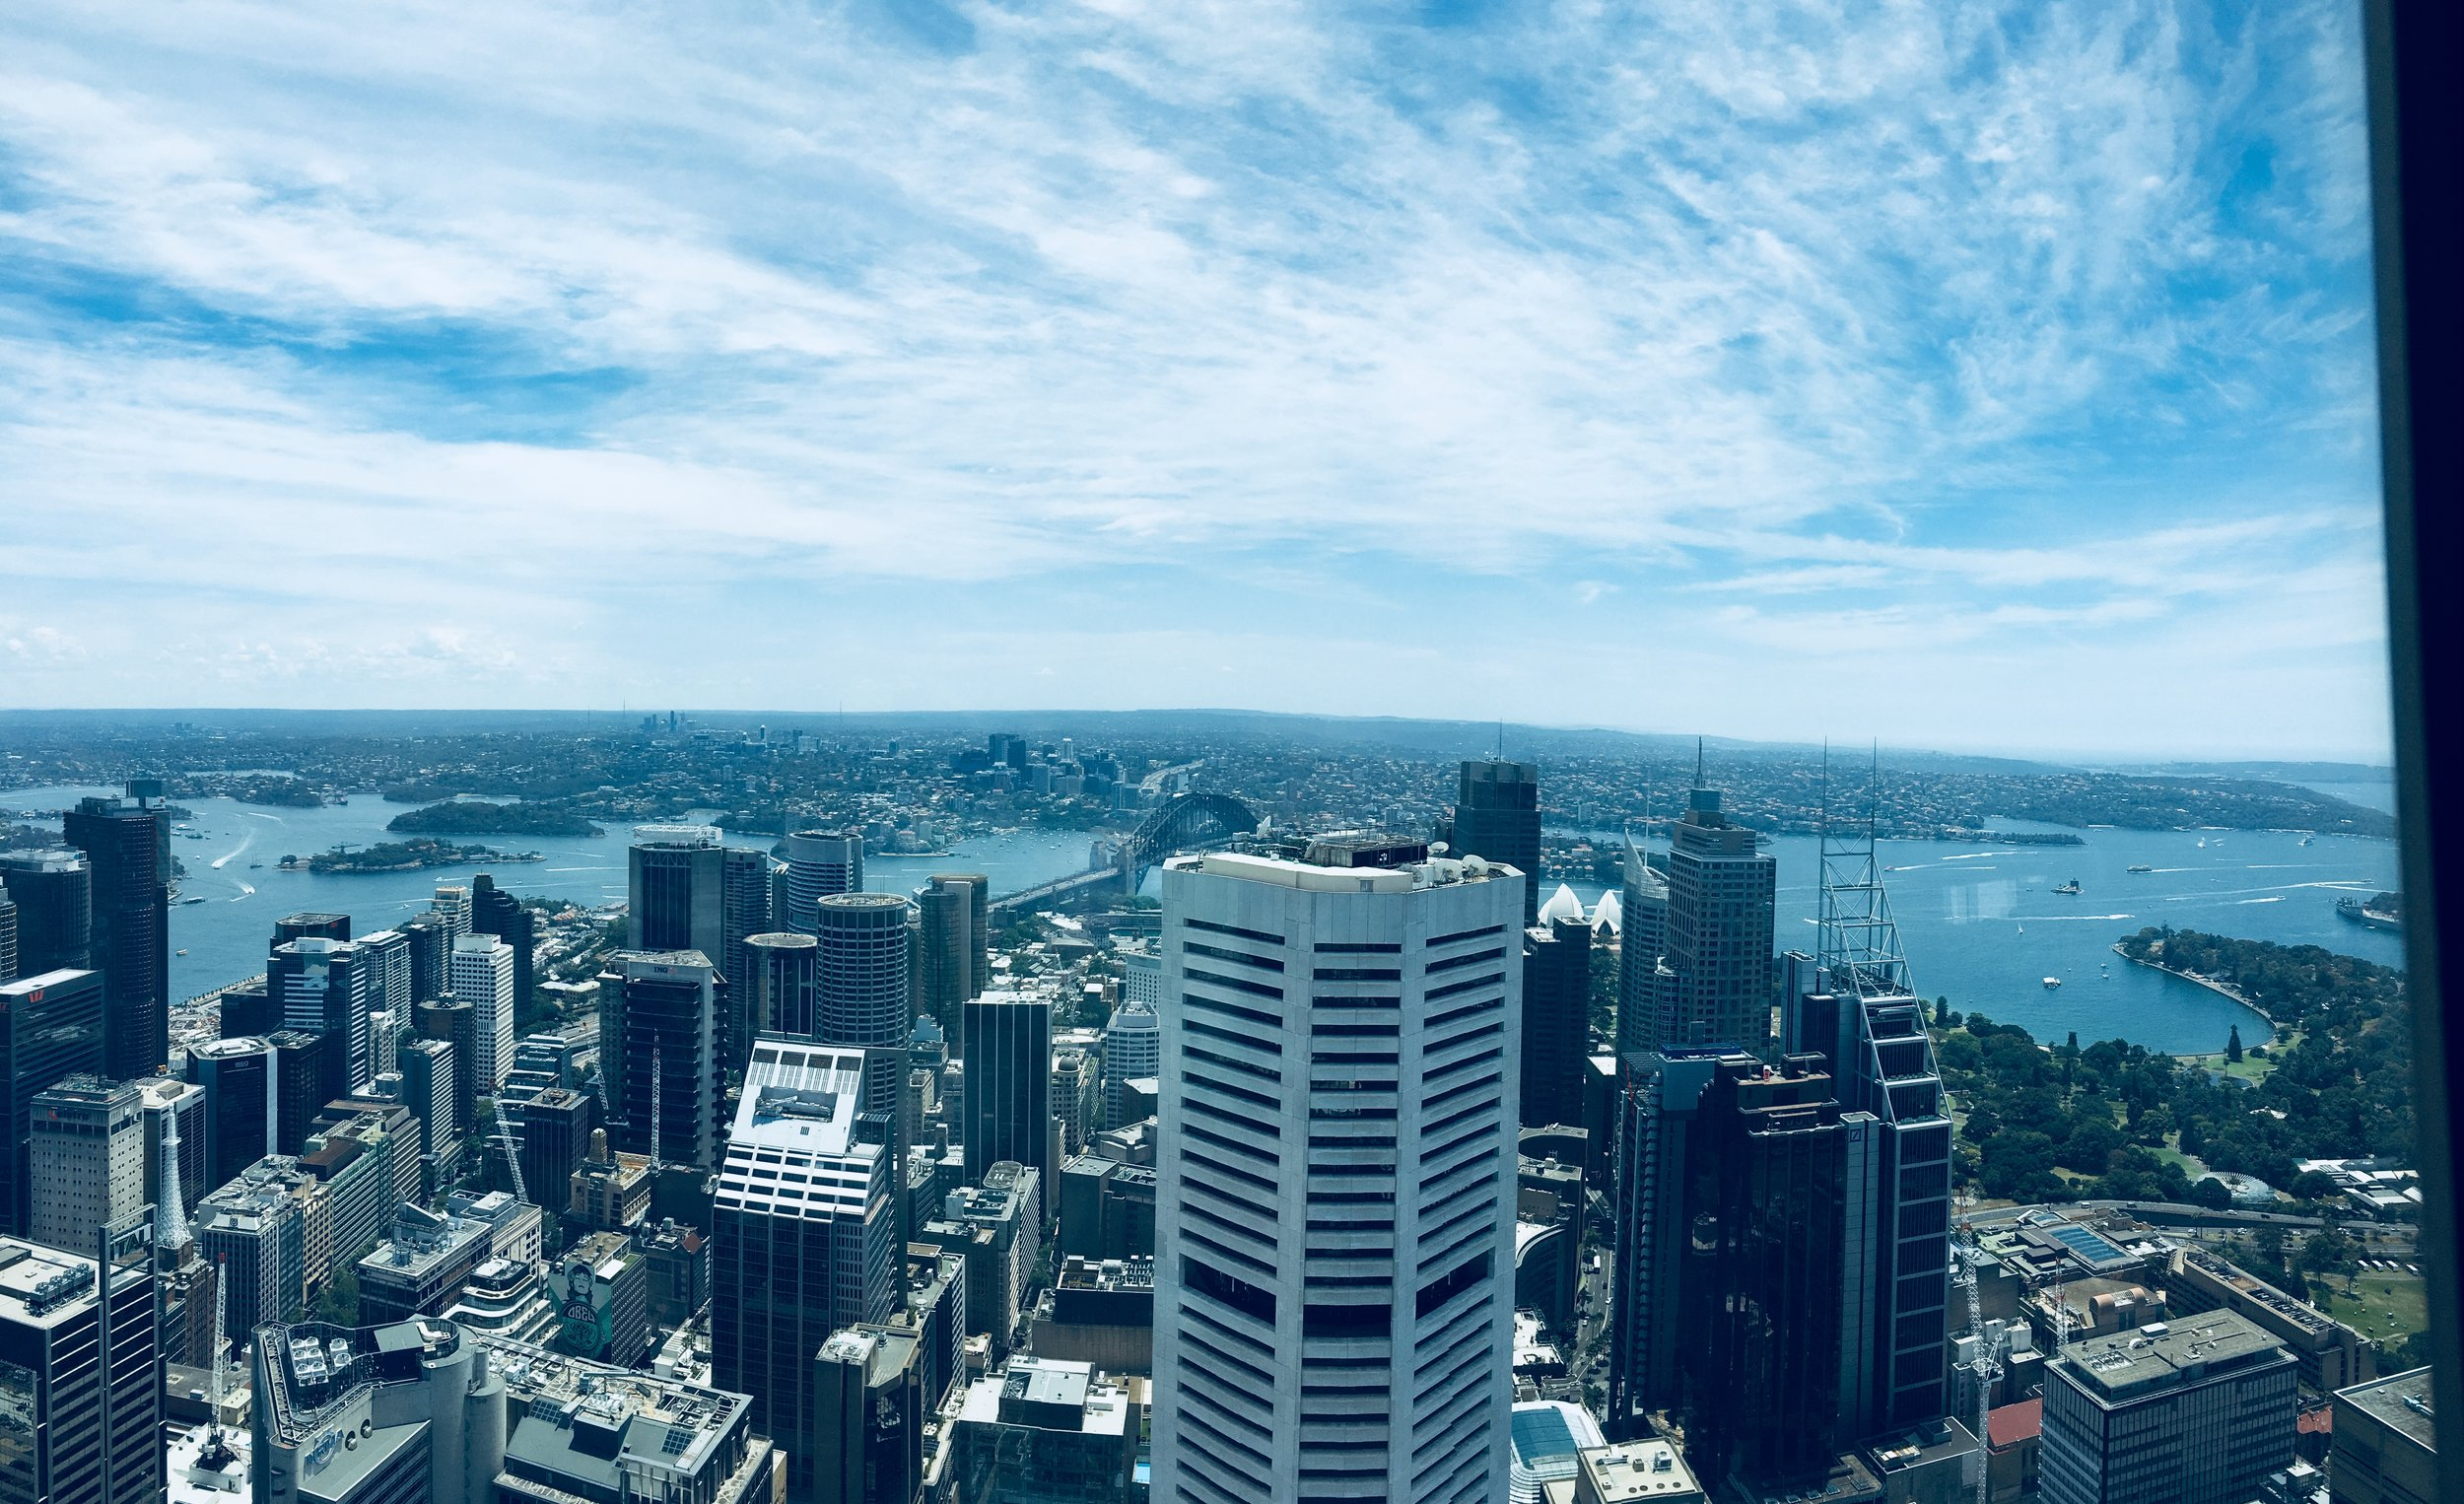 The Sydney Tower